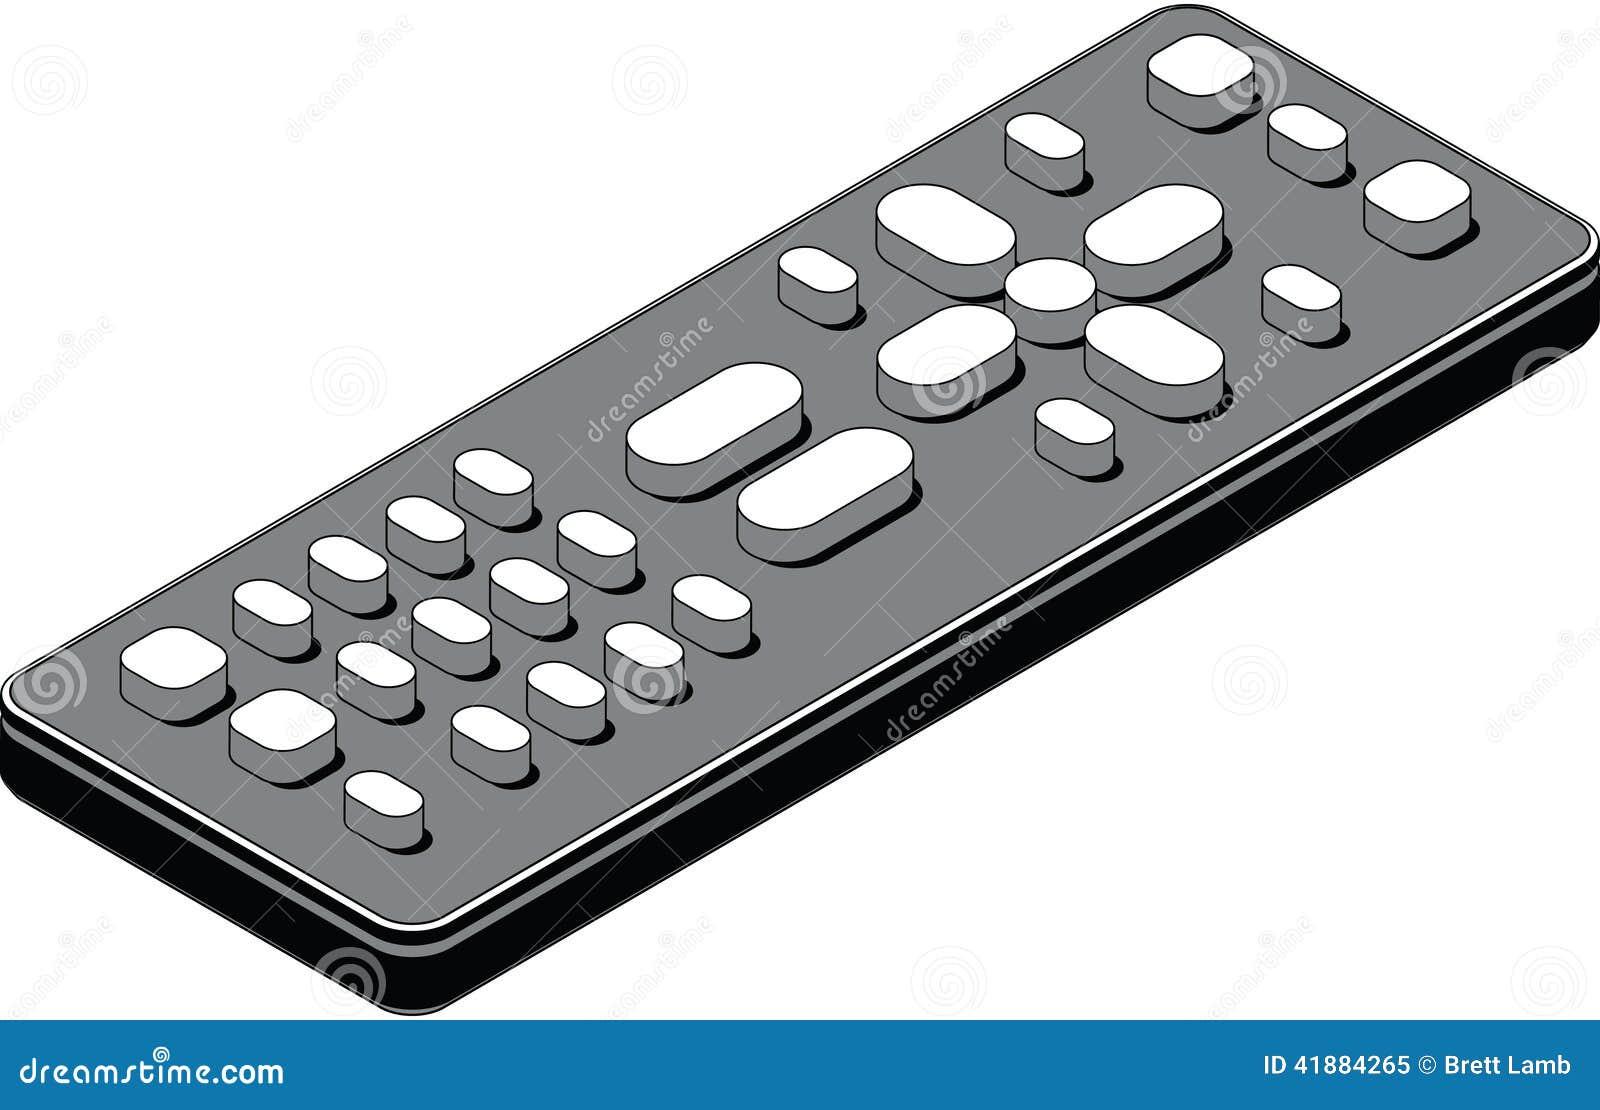 television remote control stock illustration image 41884265